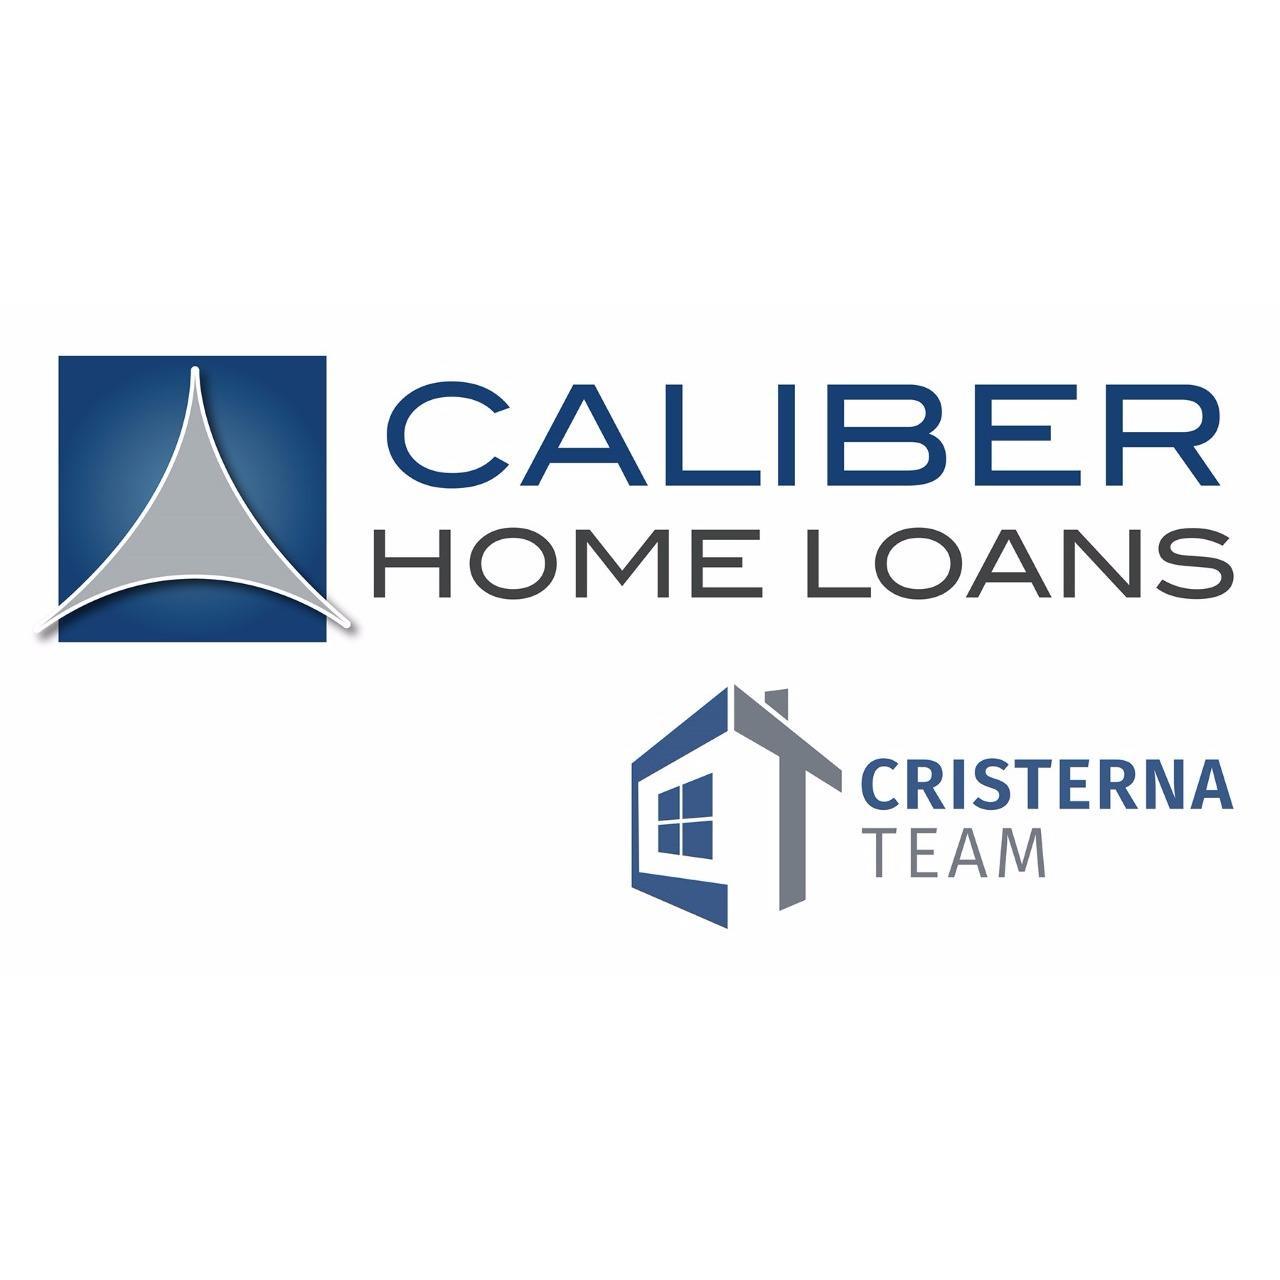 Caliber home loans cristerna team gilbert arizona az for C home loans